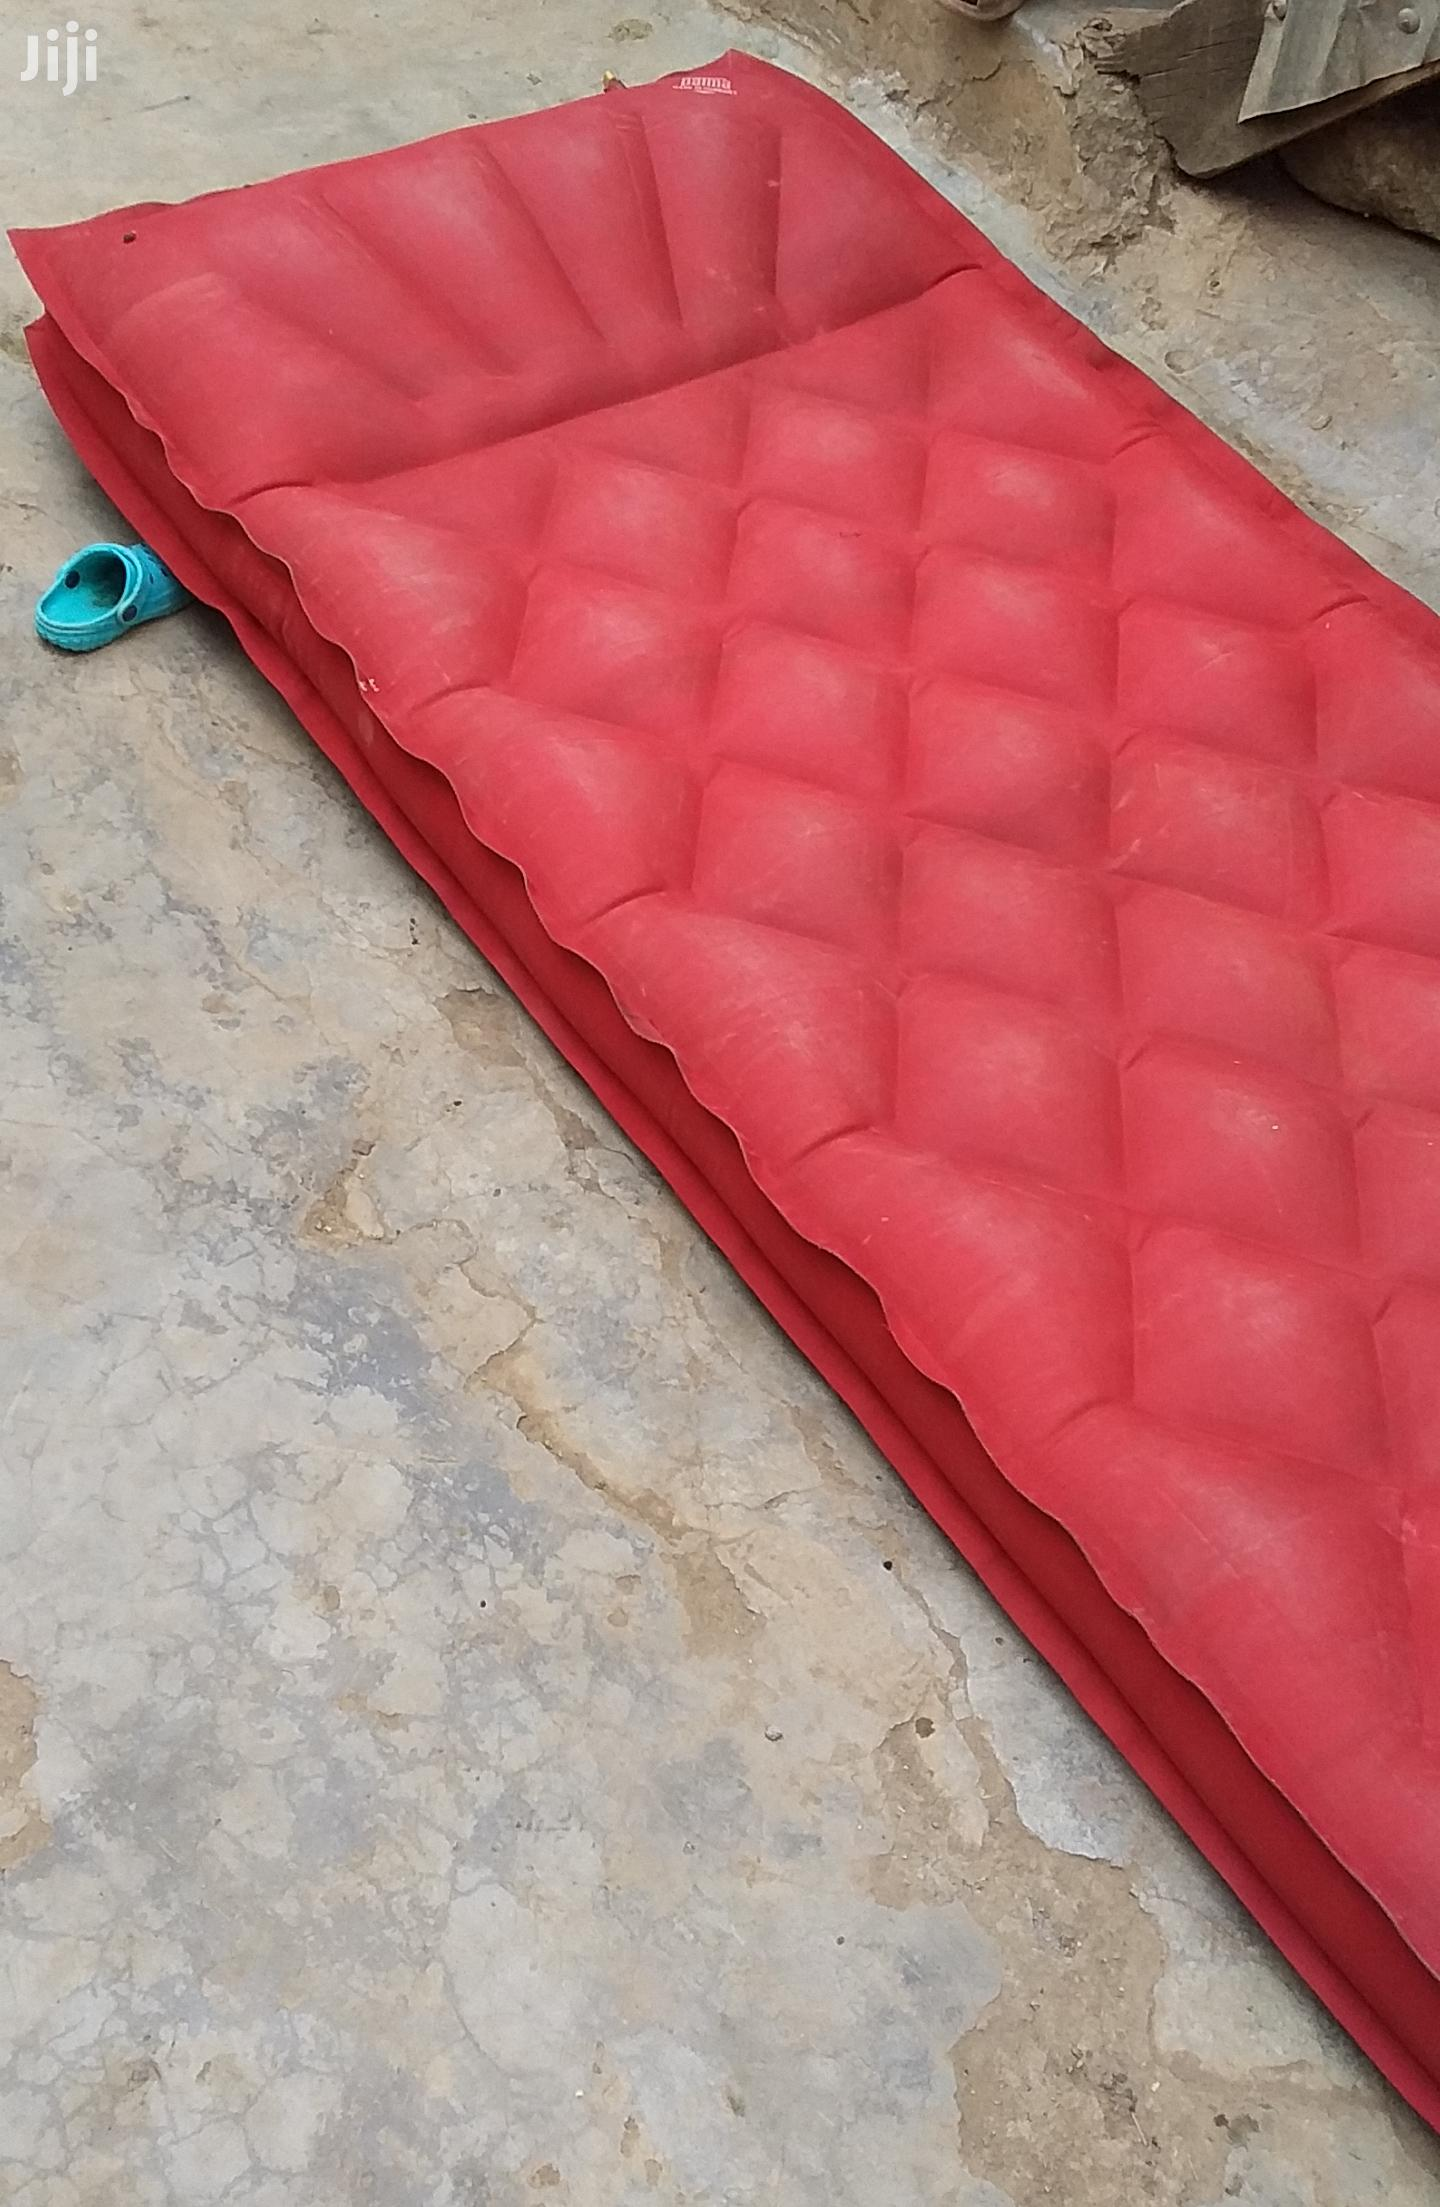 Inflatable Mattress | Camping Gear for sale in Karen, Nairobi, Kenya